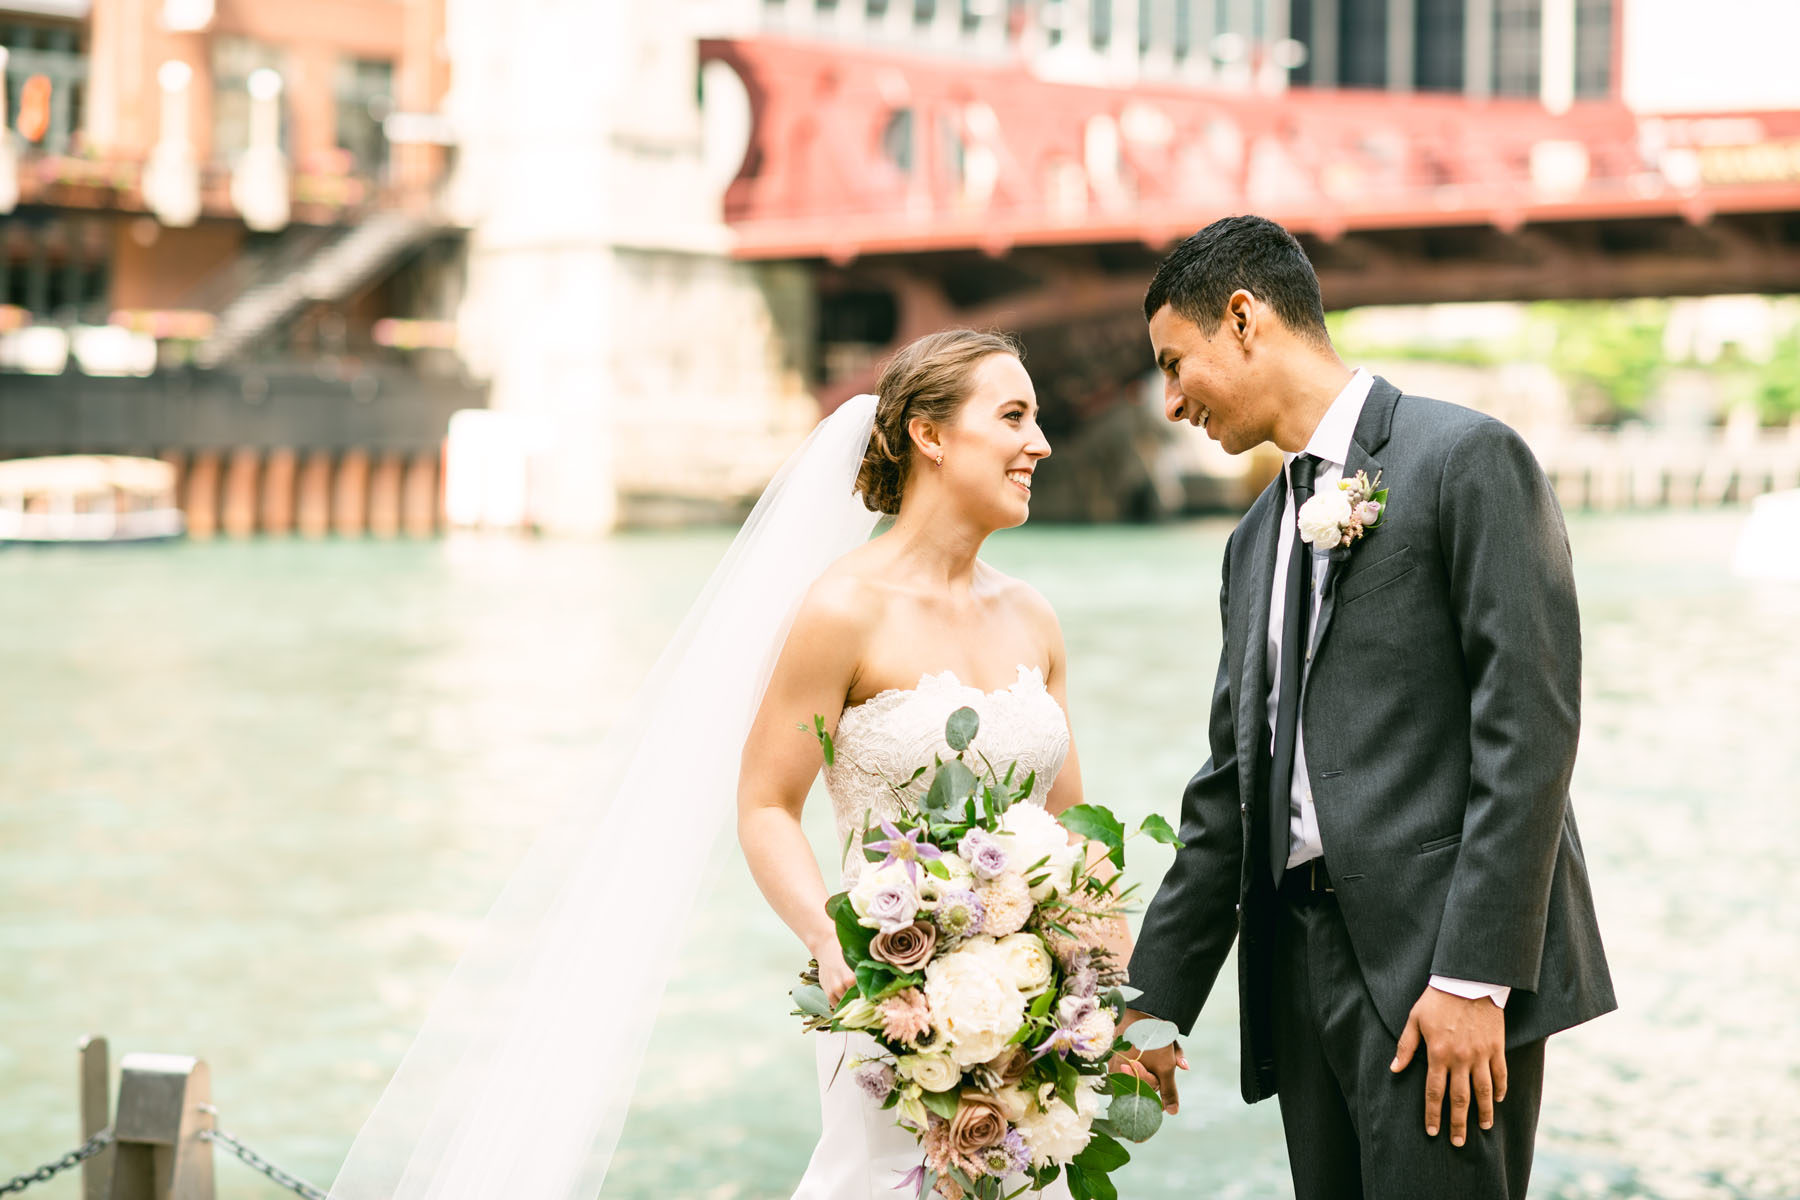 Chicago Rivewalk Wedding